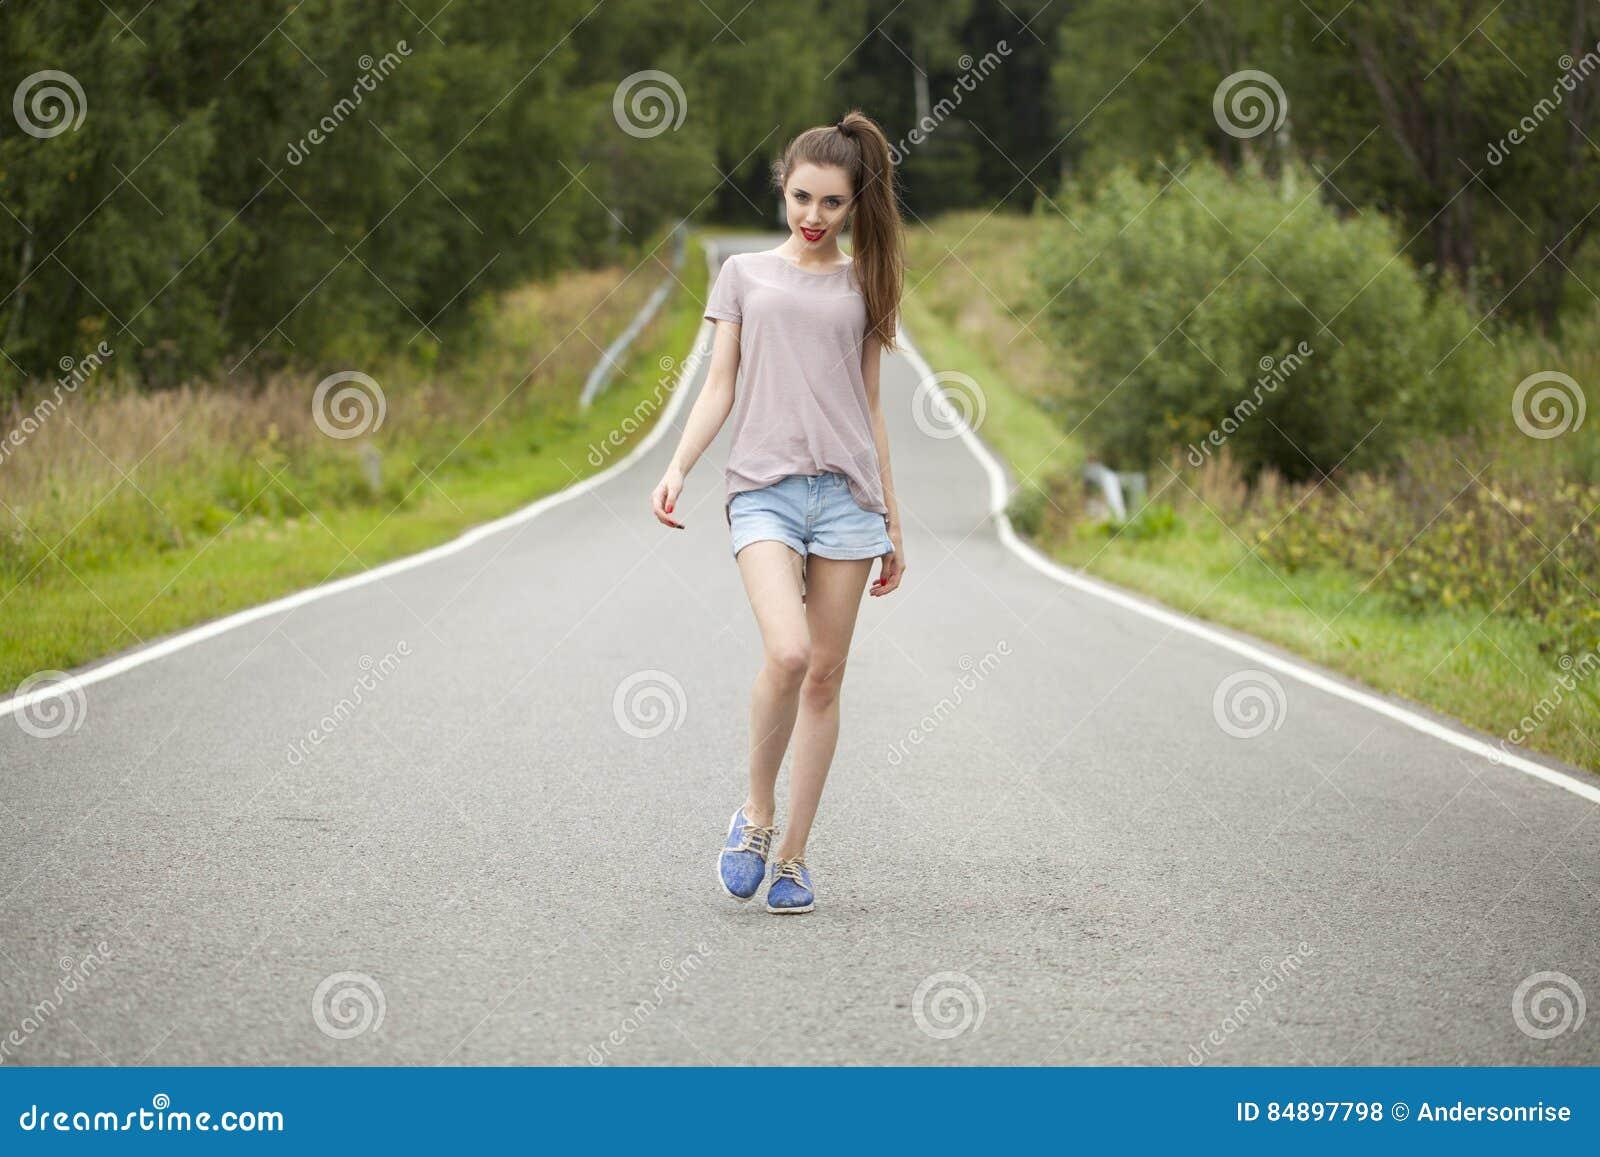 Young beautiful woman walking in a field, summer outdoors